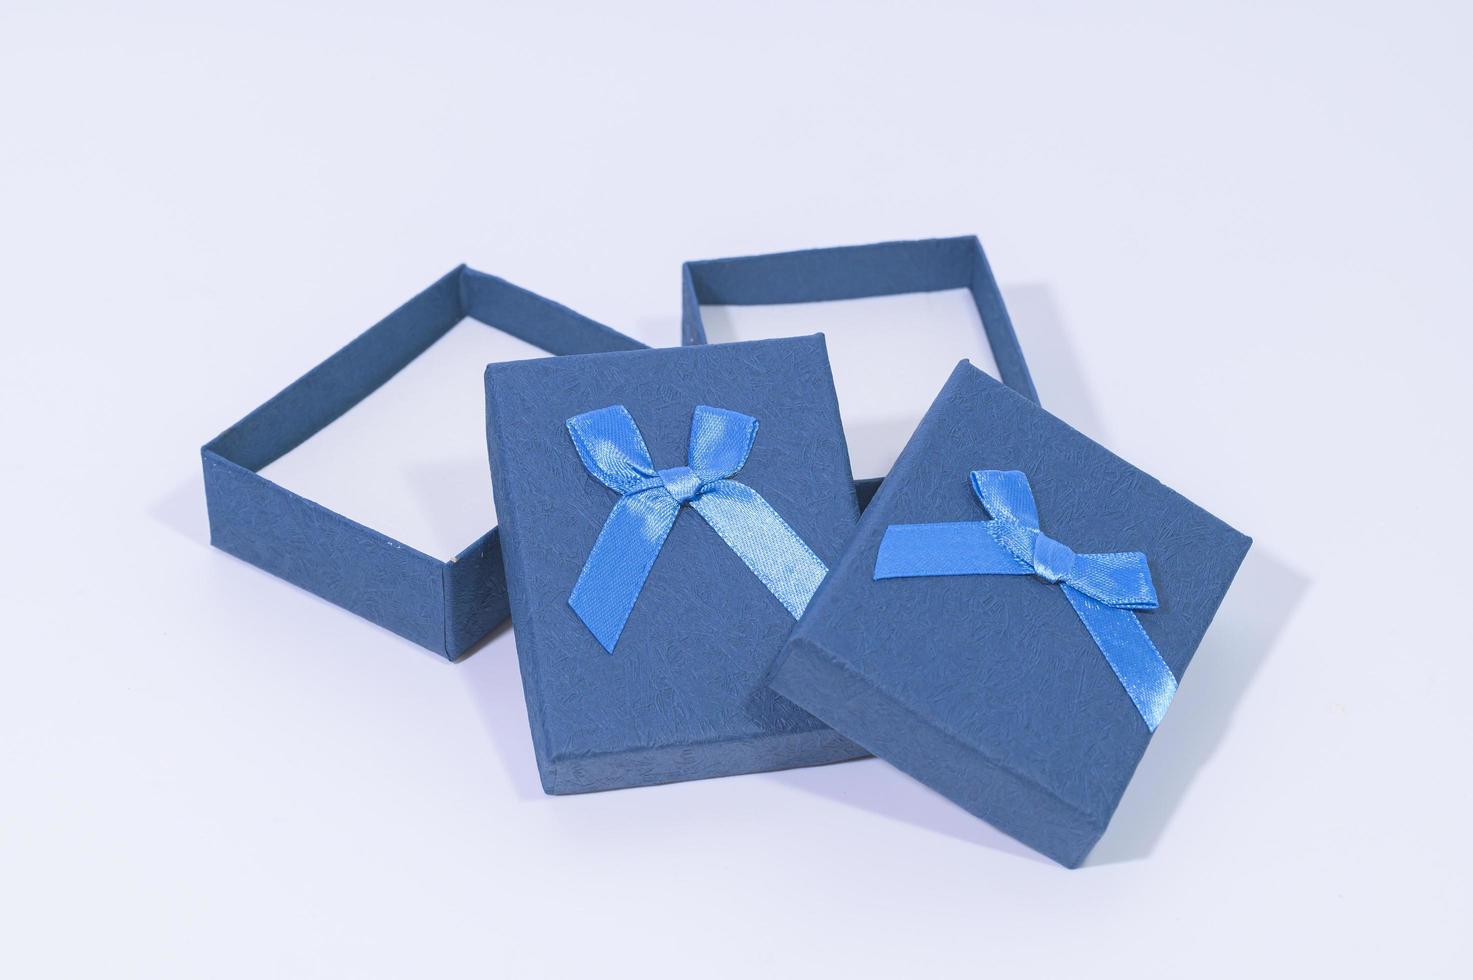 geschenkdozen op witte achtergrond foto